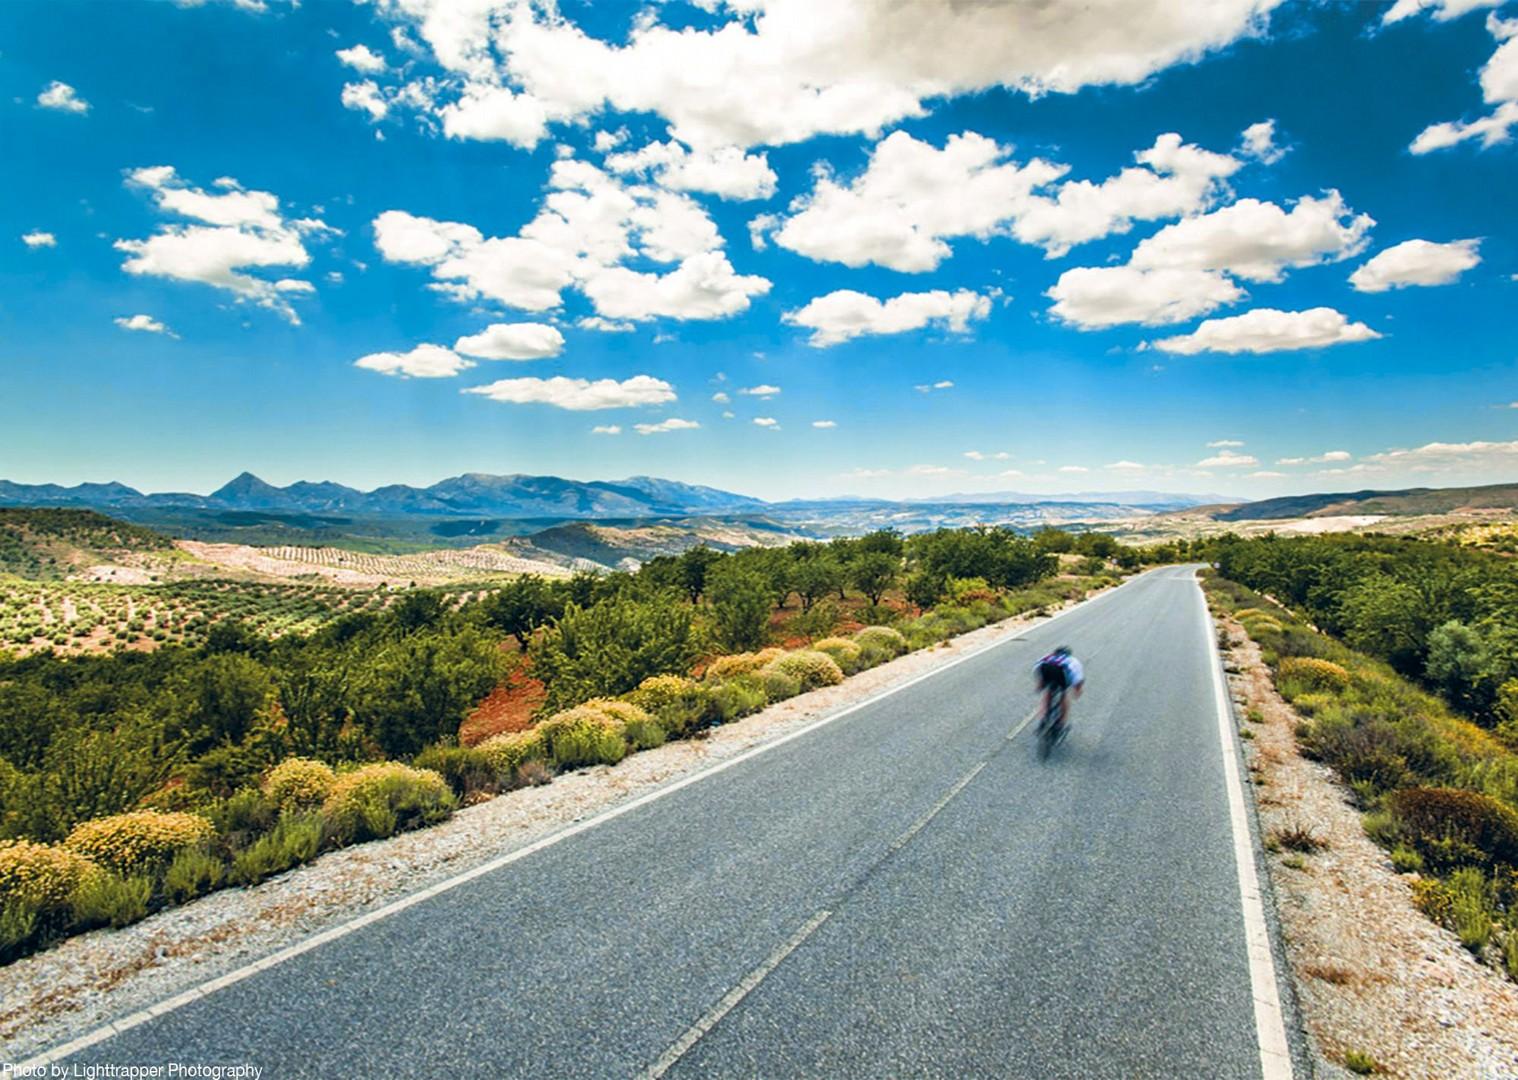 southern-spain-road-cycling-smooth-tarmac-incredible-views.jpg - Southern Spain - Andalucia - Los Pueblos Blancos - Road Cycling